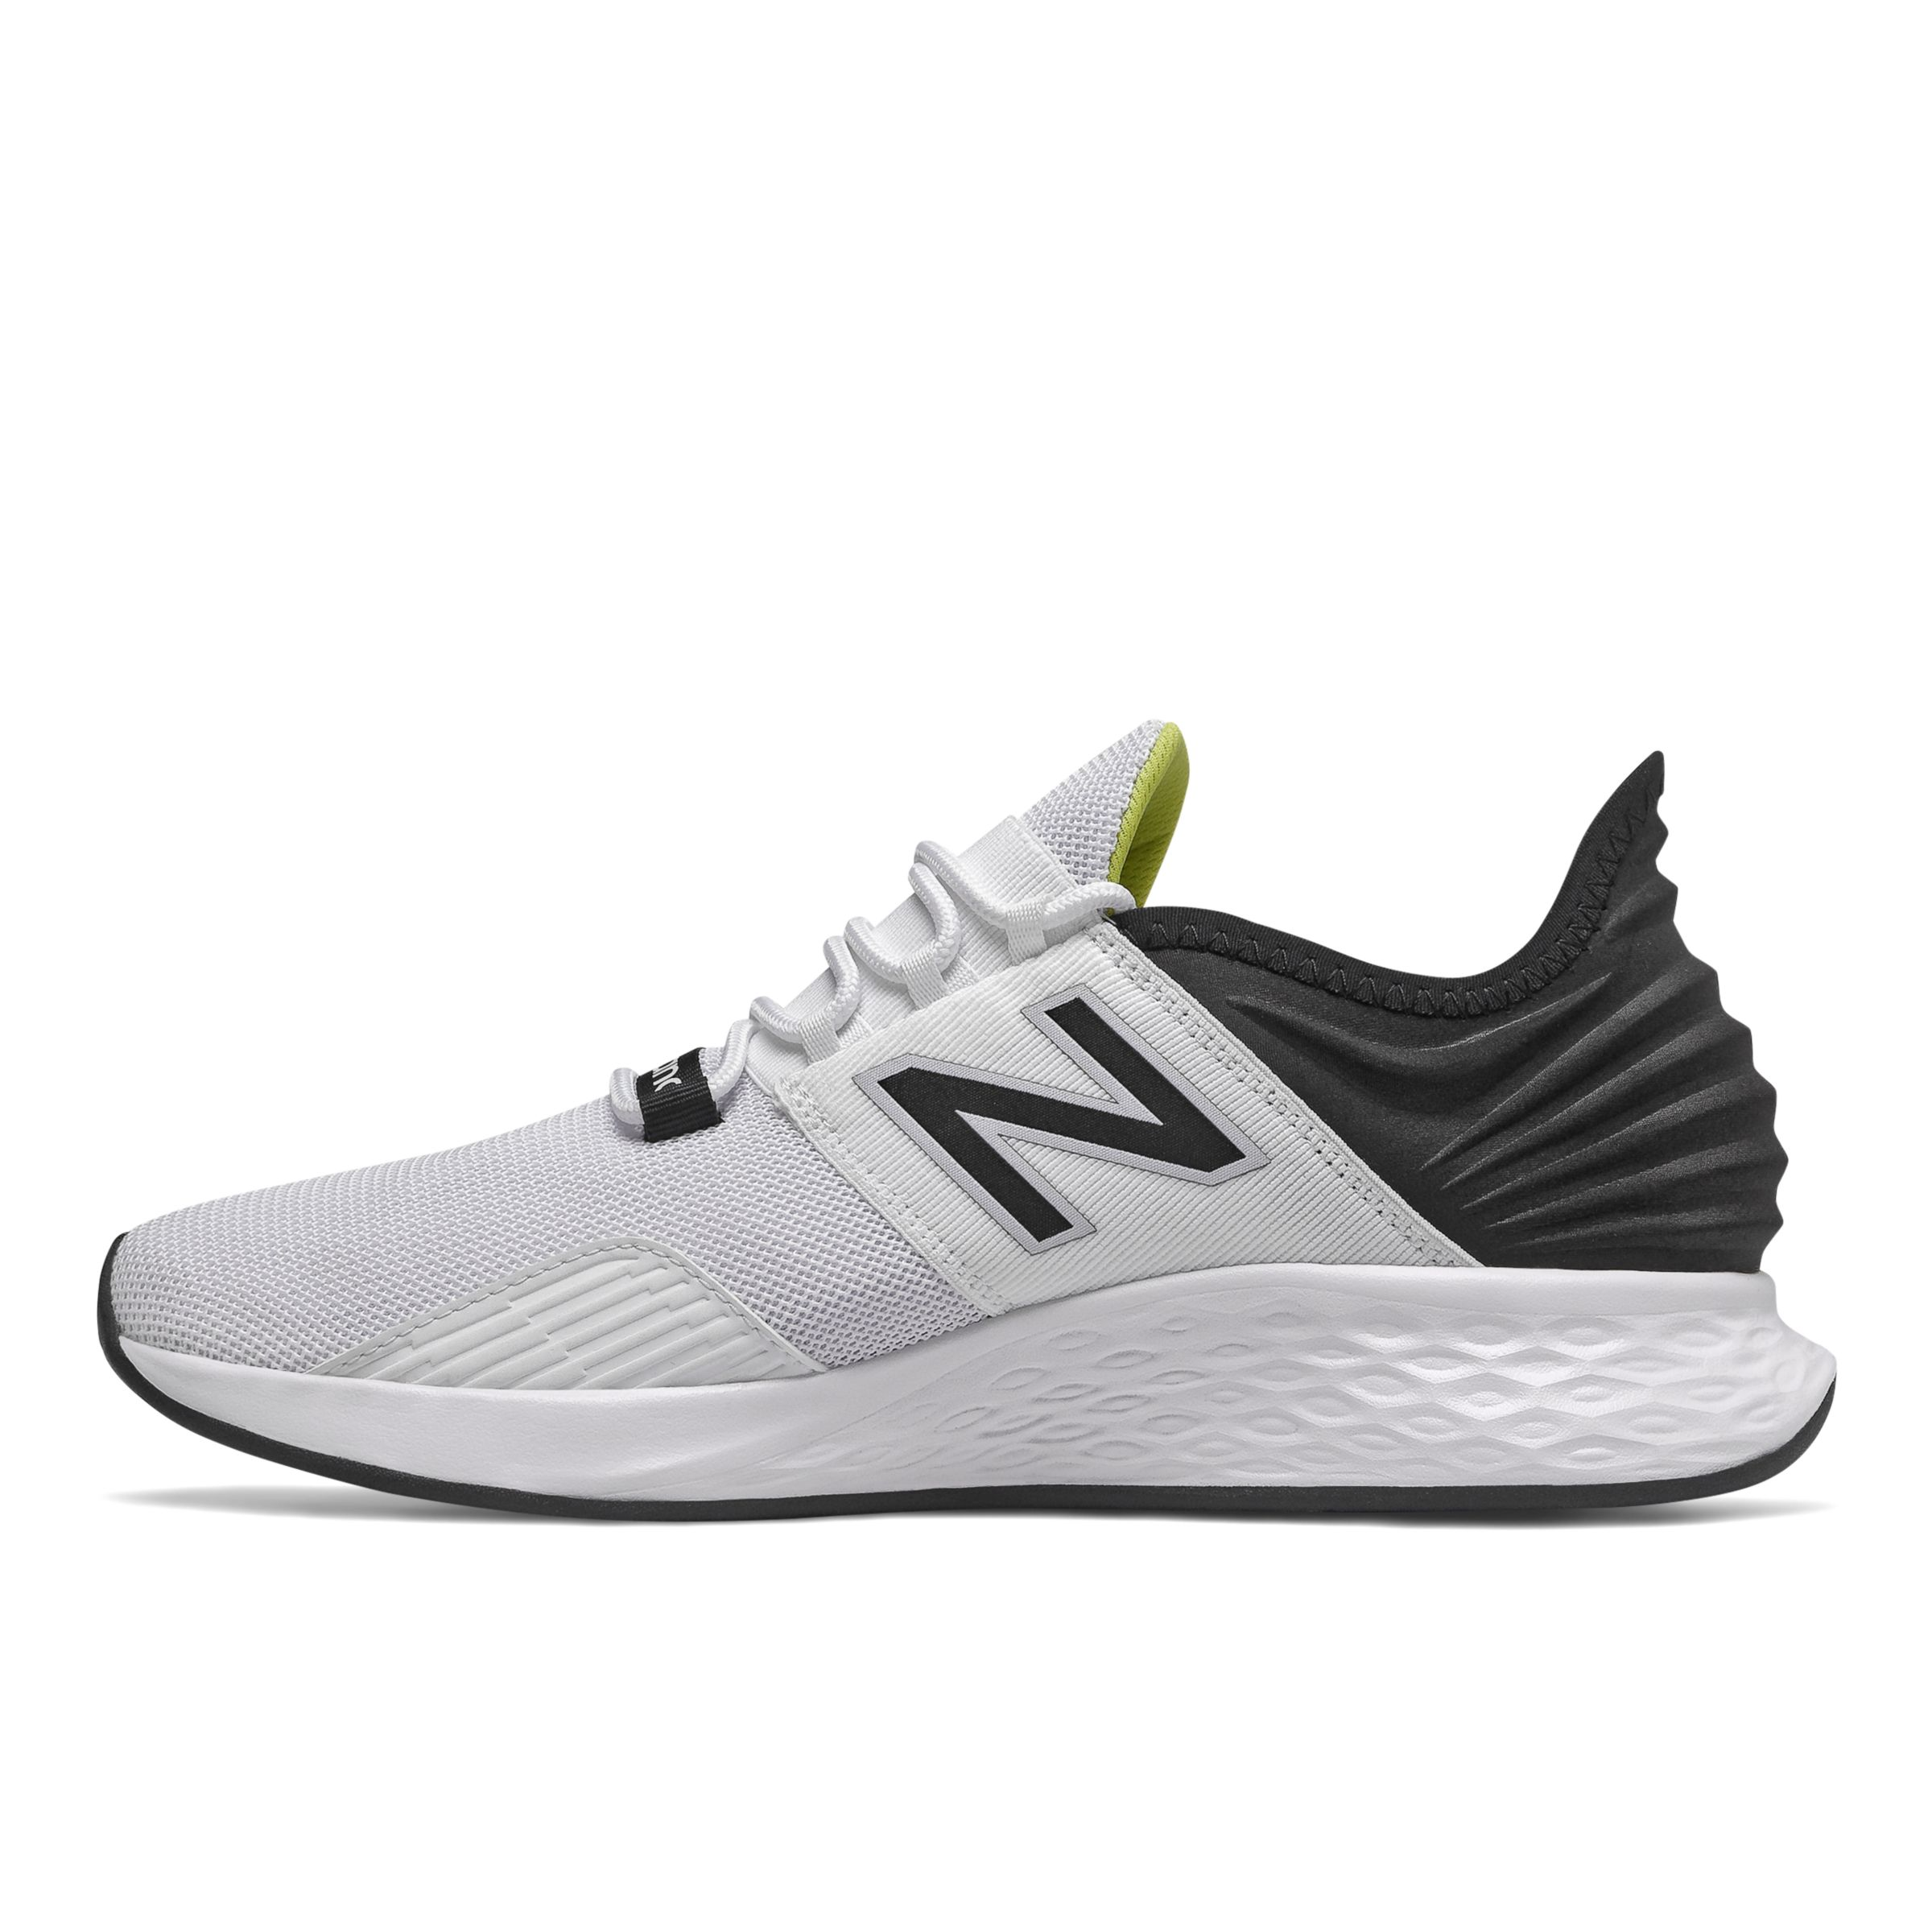 thumbnail 11 - New-Balance-Fresh-Foam-Roav-Men-039-s-Running-Sport-Lifestyle-Shoes